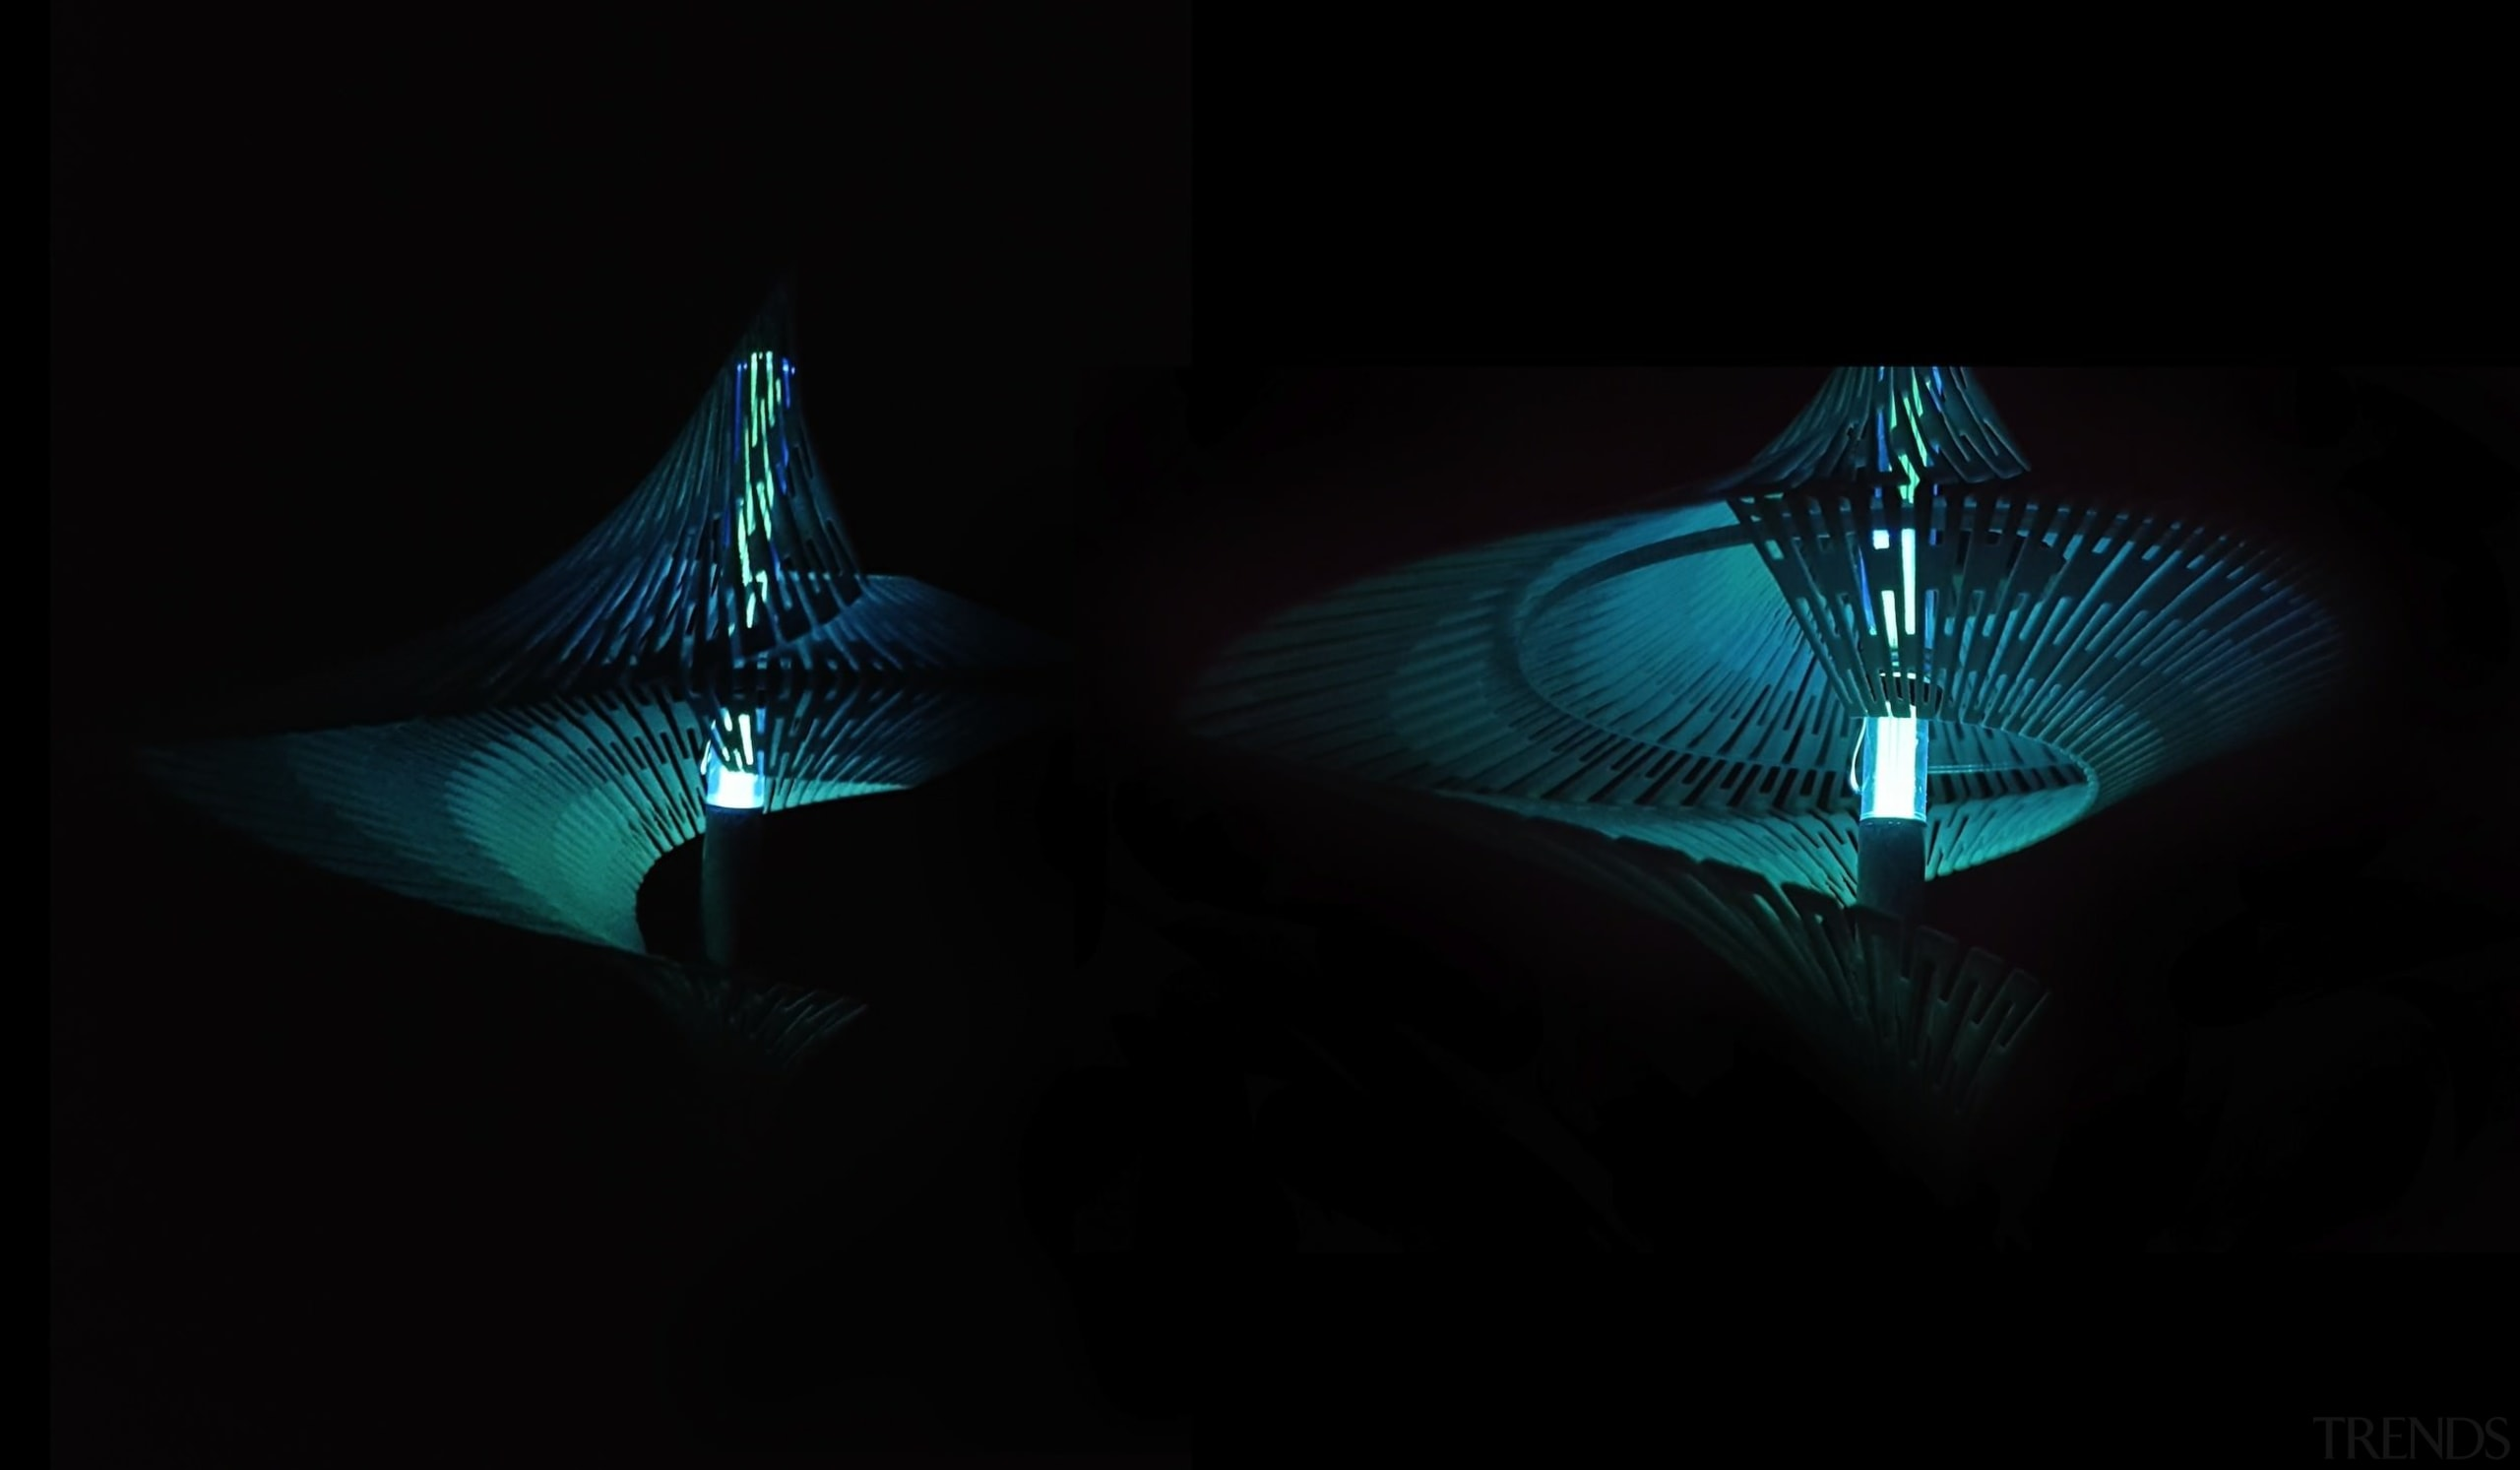 Designed by Margot Krasojevic darkness, light, lighting, night, black